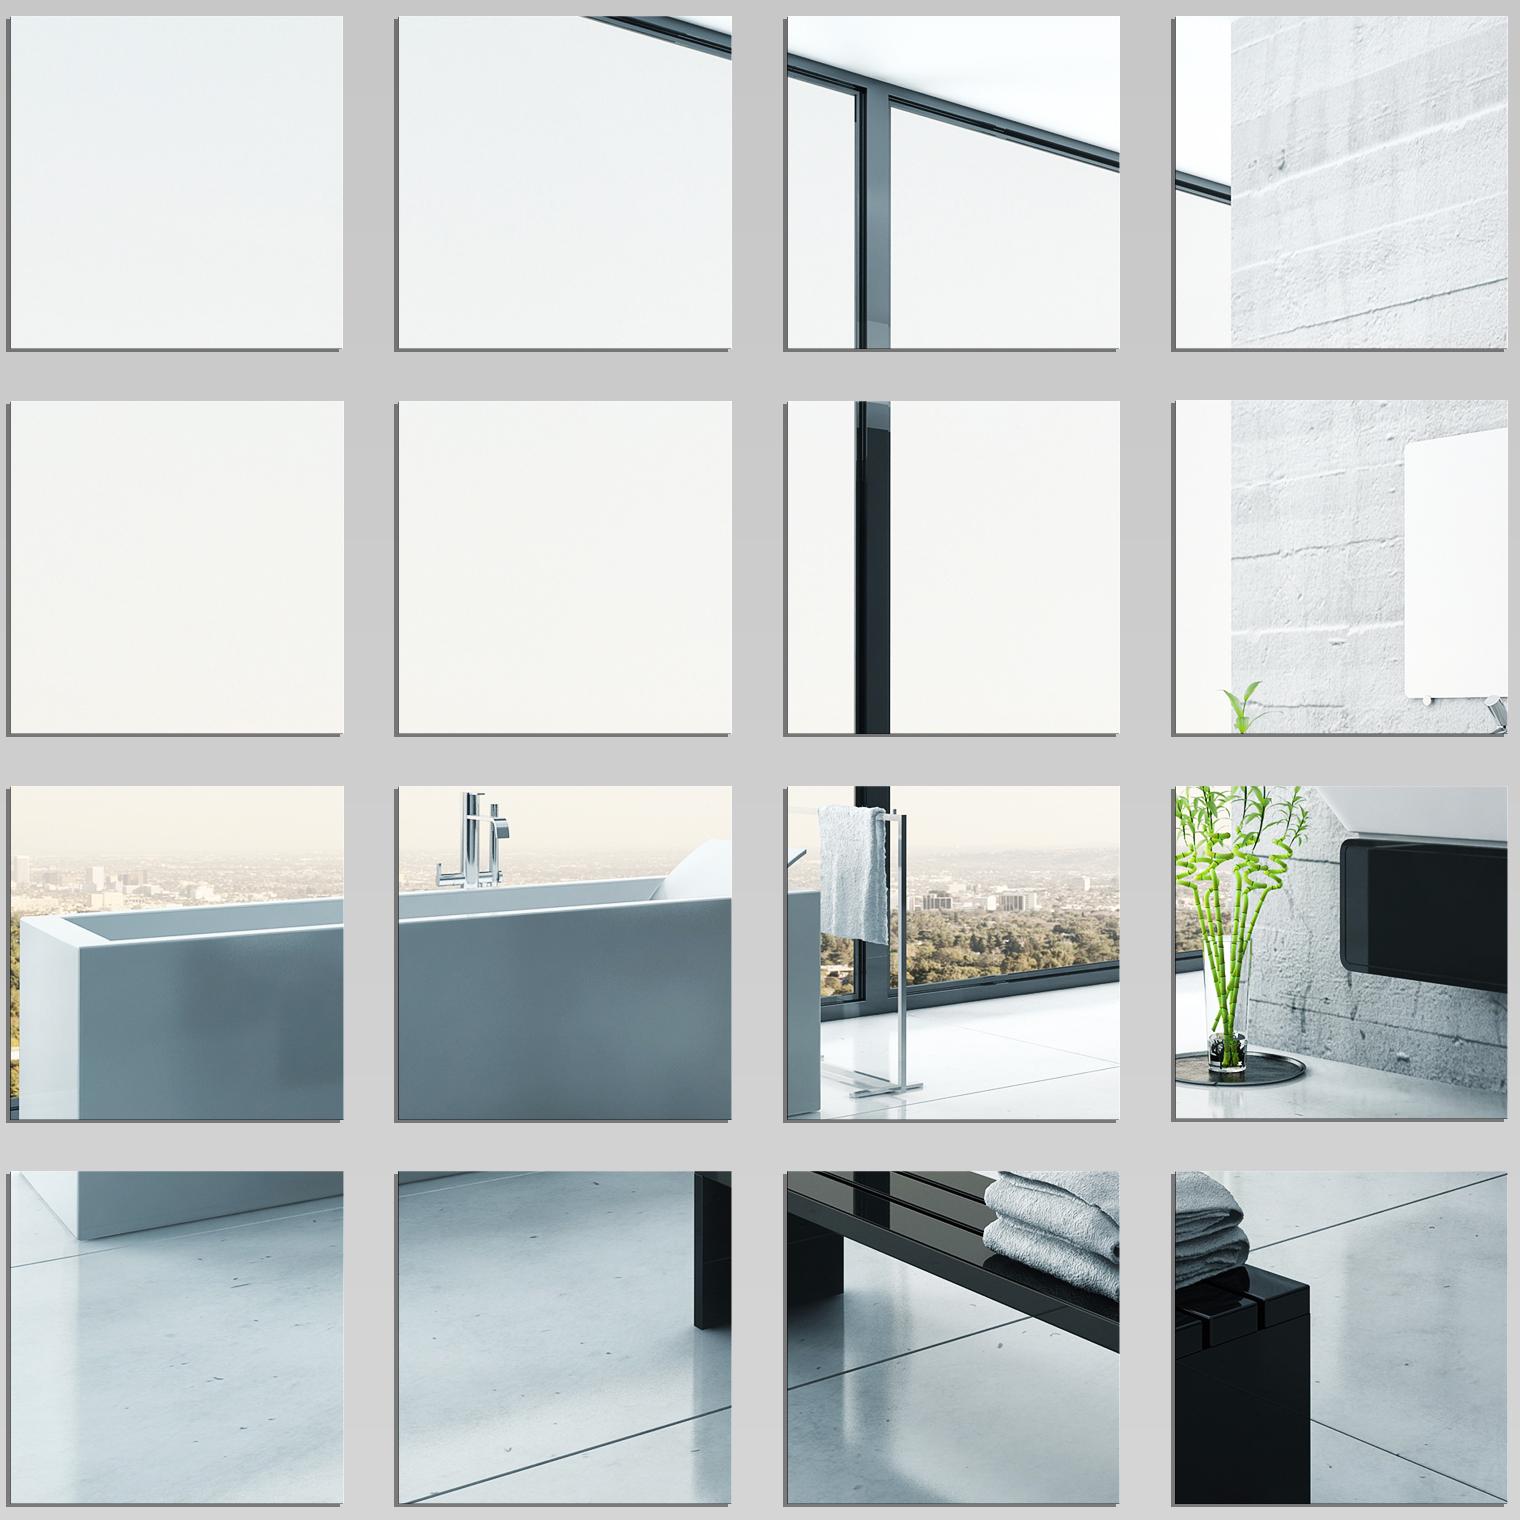 K p fyrkantig spegel v gg klisterm rken 15 15 cm 9 st f rp for Ikea specchi adesivi